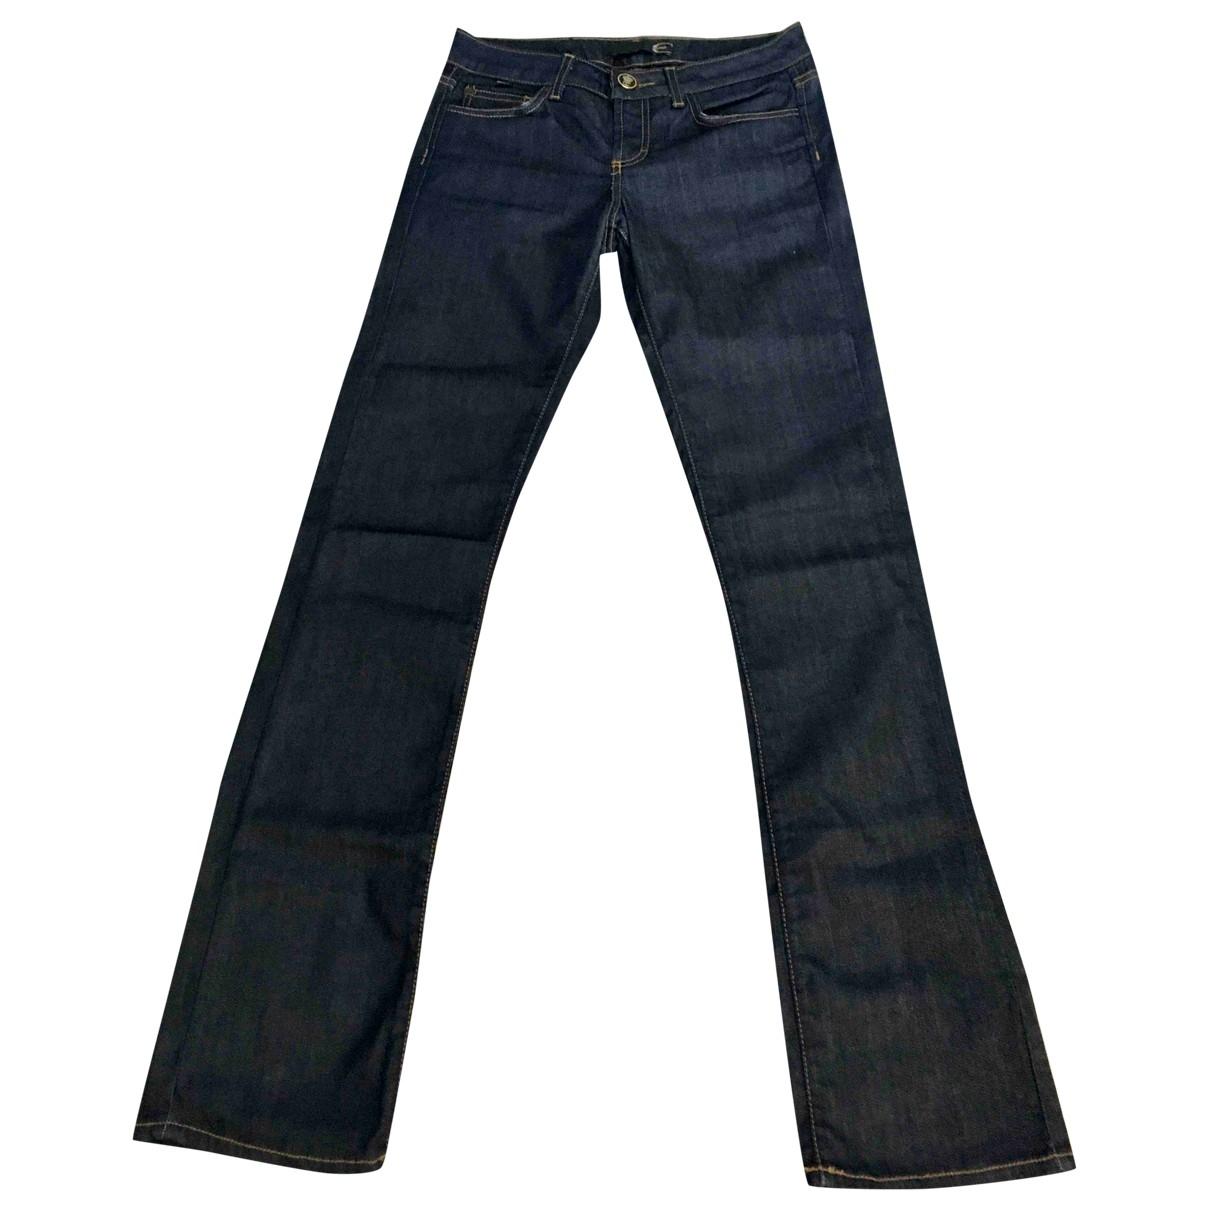 Just Cavalli \N Blue Denim - Jeans Jeans for Women 24 US